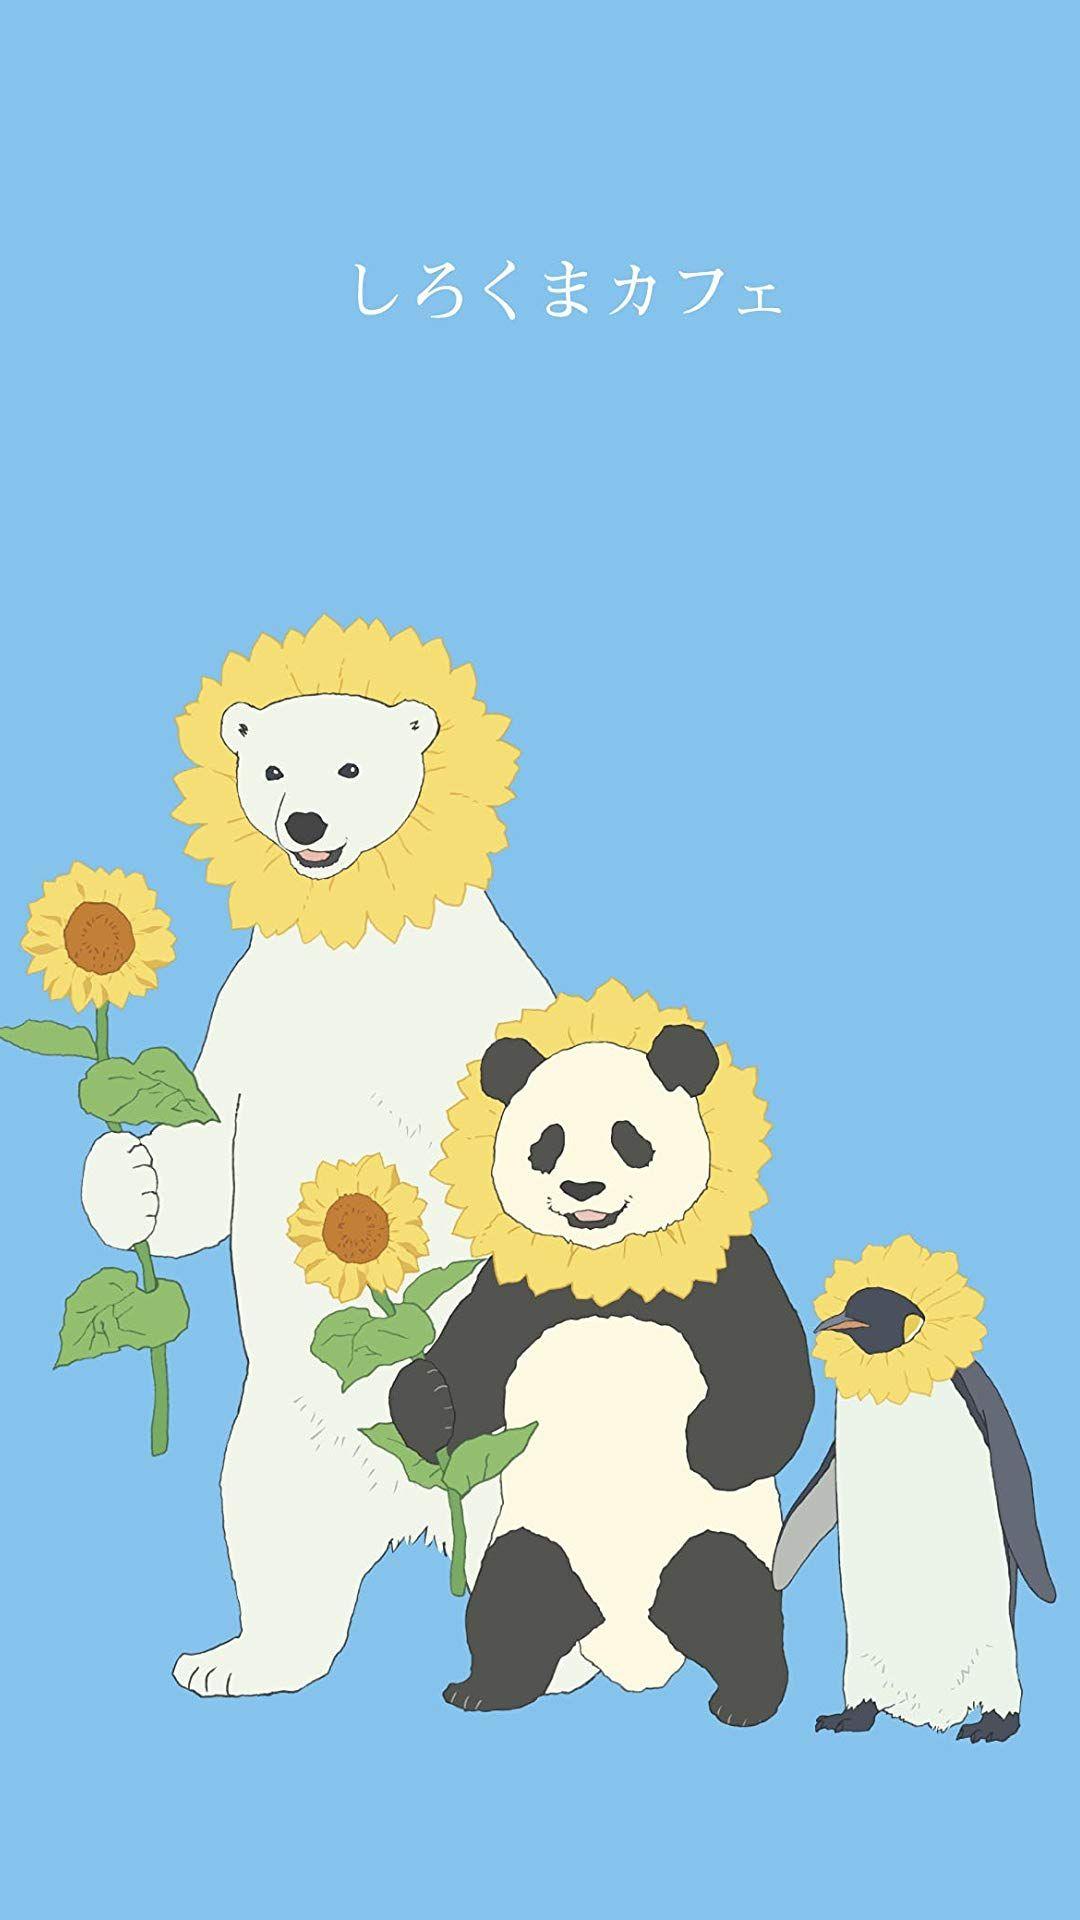 Shirokuma Cafe Anime Iphone Wallpapers 貓咪 In 2019 Polar Bear